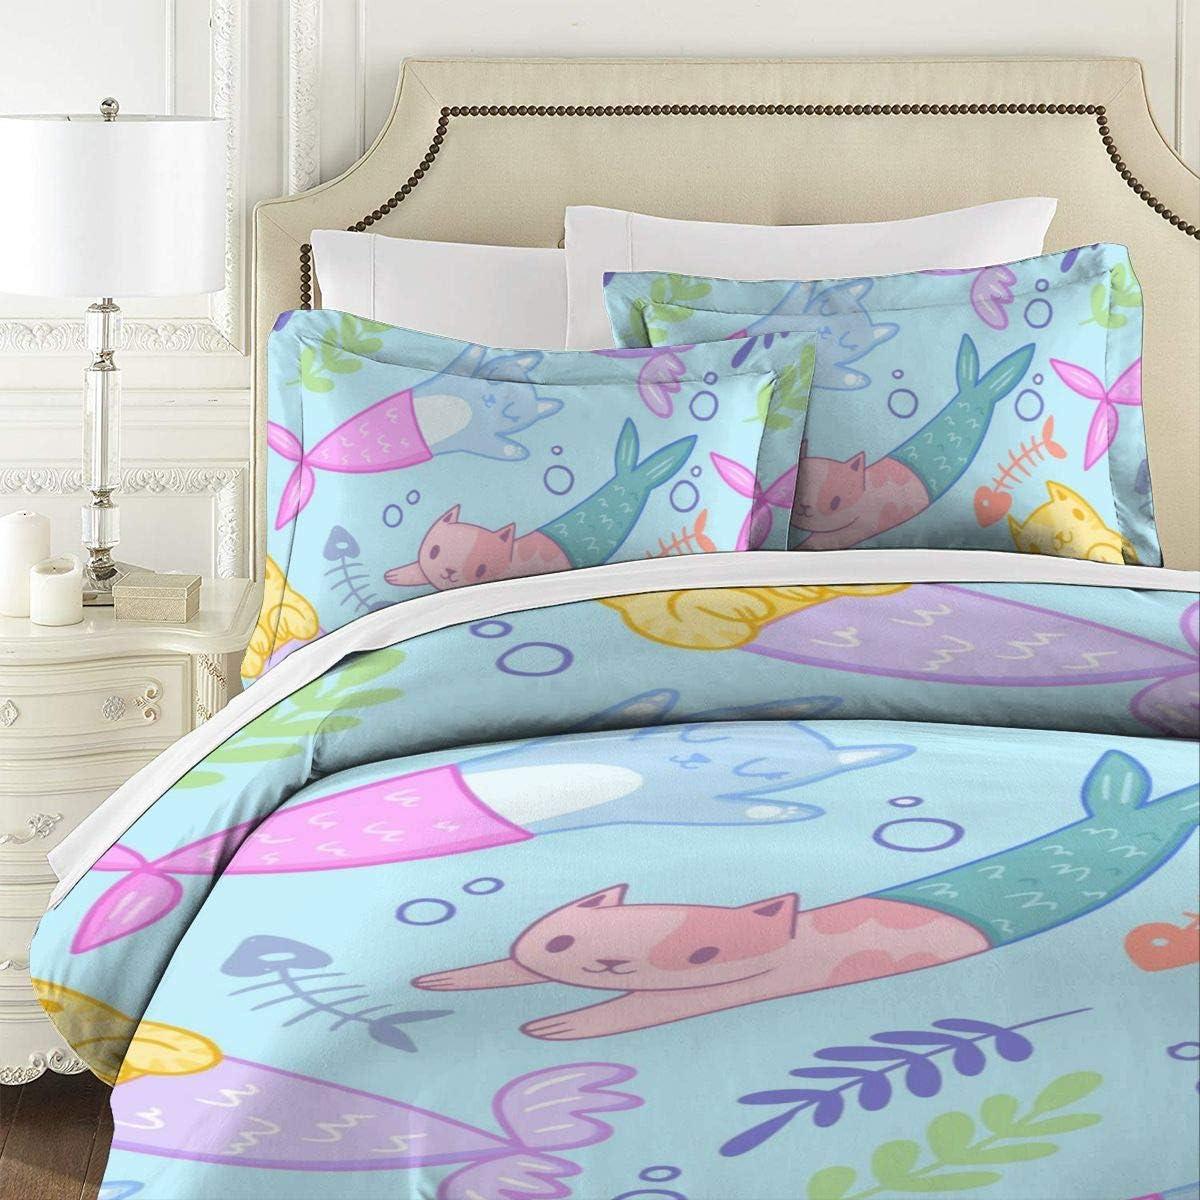 AUISS 3 Piece Bedding Import Set Cat Quilt Kitten Mermaid Ranking TOP6 Bedroom Cover